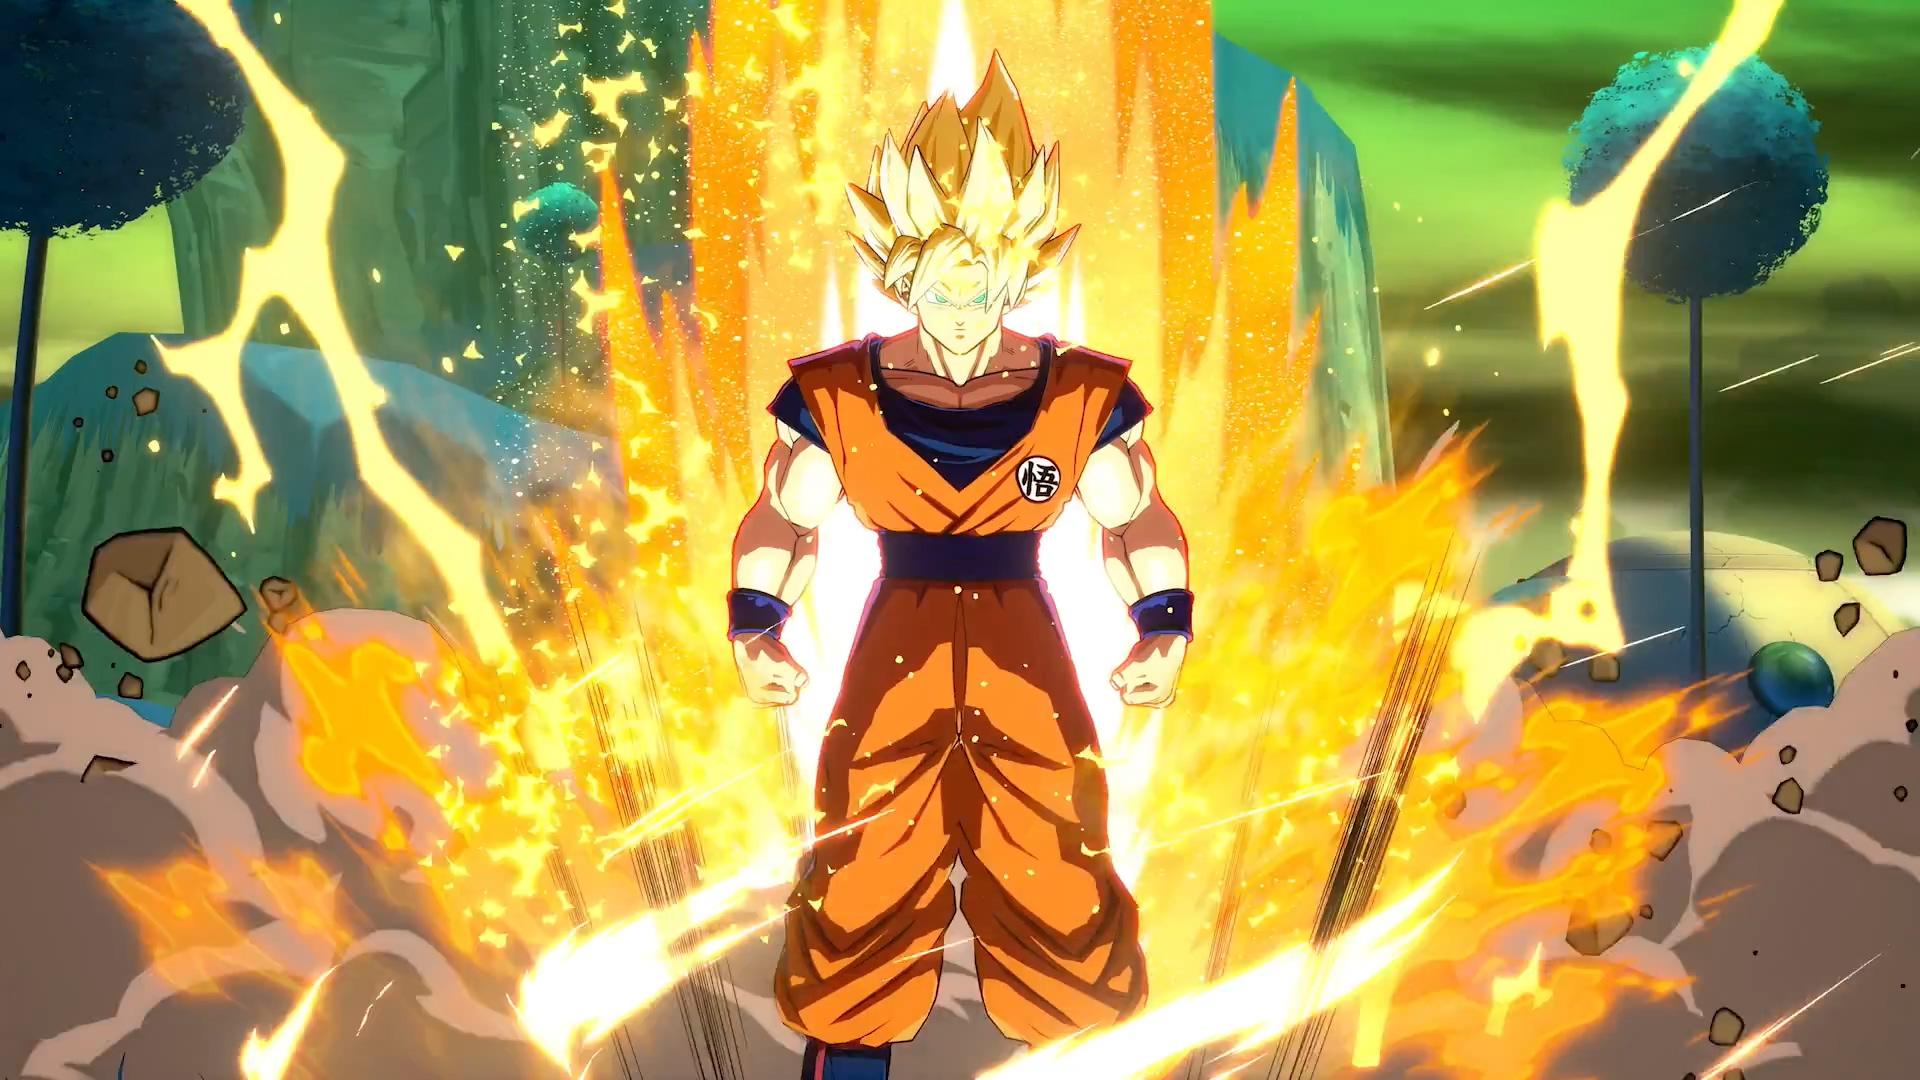 Dragon Ball FighterZ feels like playing the show screenshot